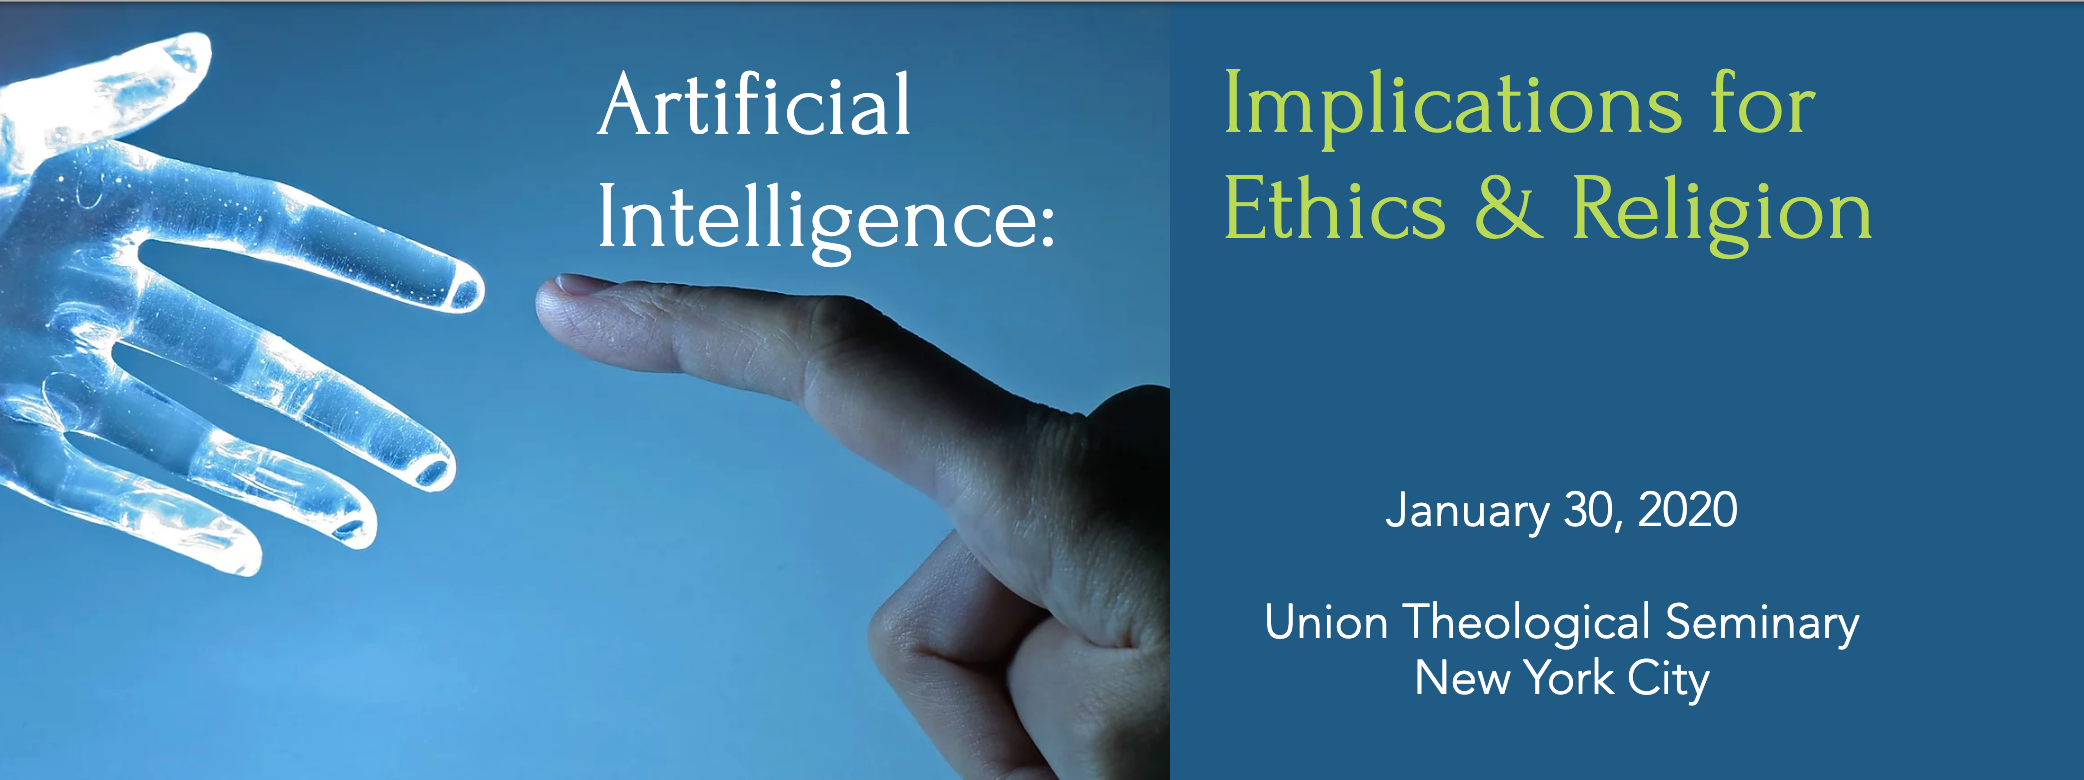 New Conference AI